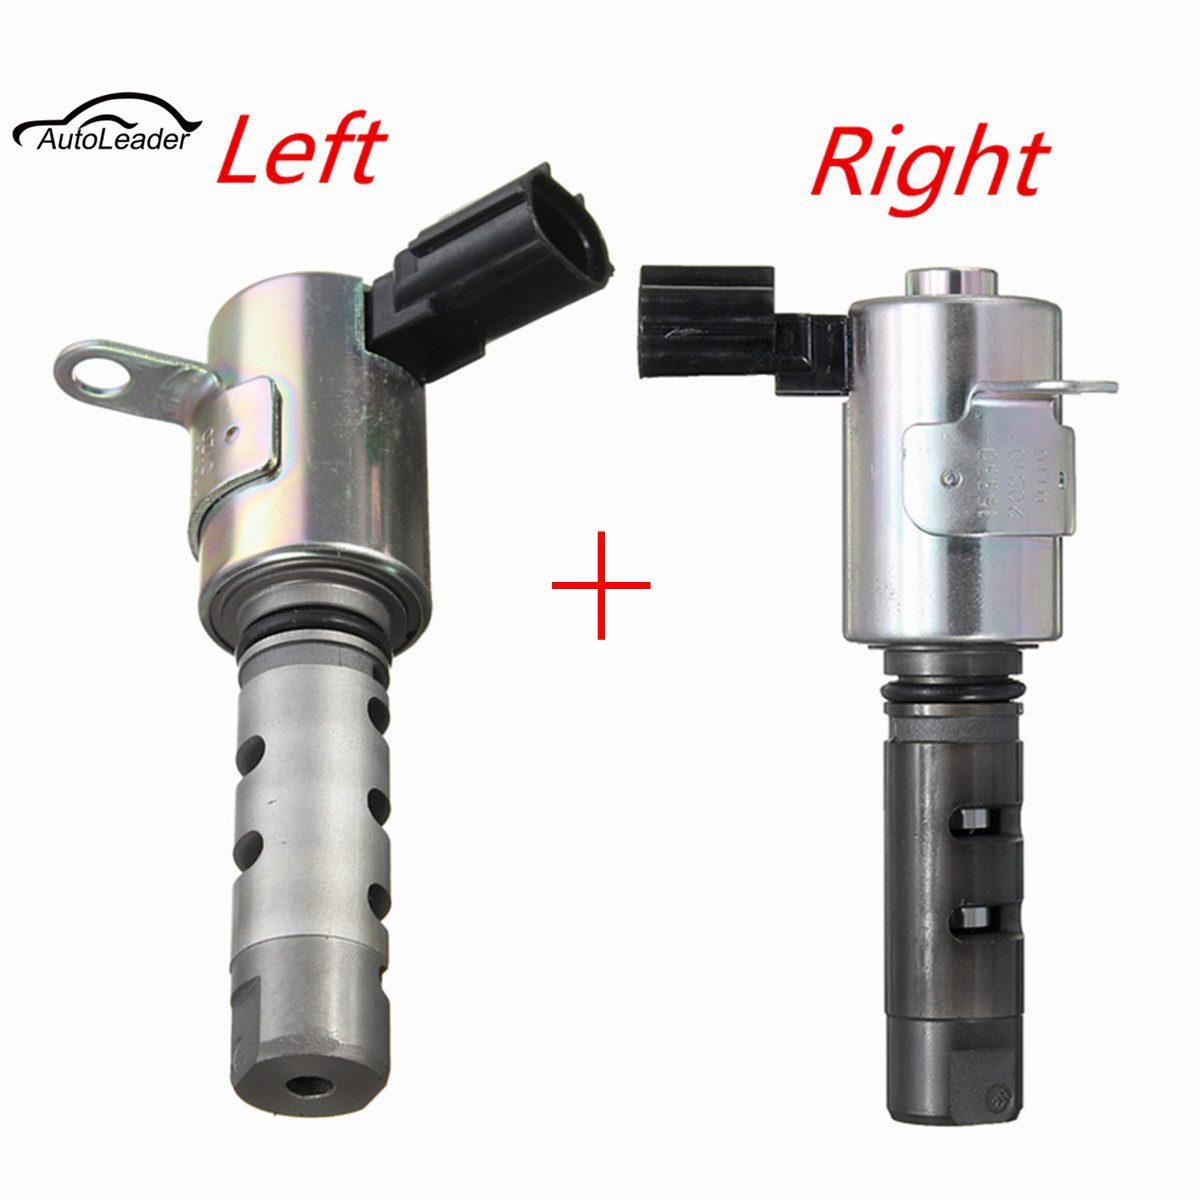 2x Left & Right VVT Variable Timing Solenoid Valve 153400A010 153300A010 For Toyota Avalon Camry Highlander Sienna Solara /Lexus